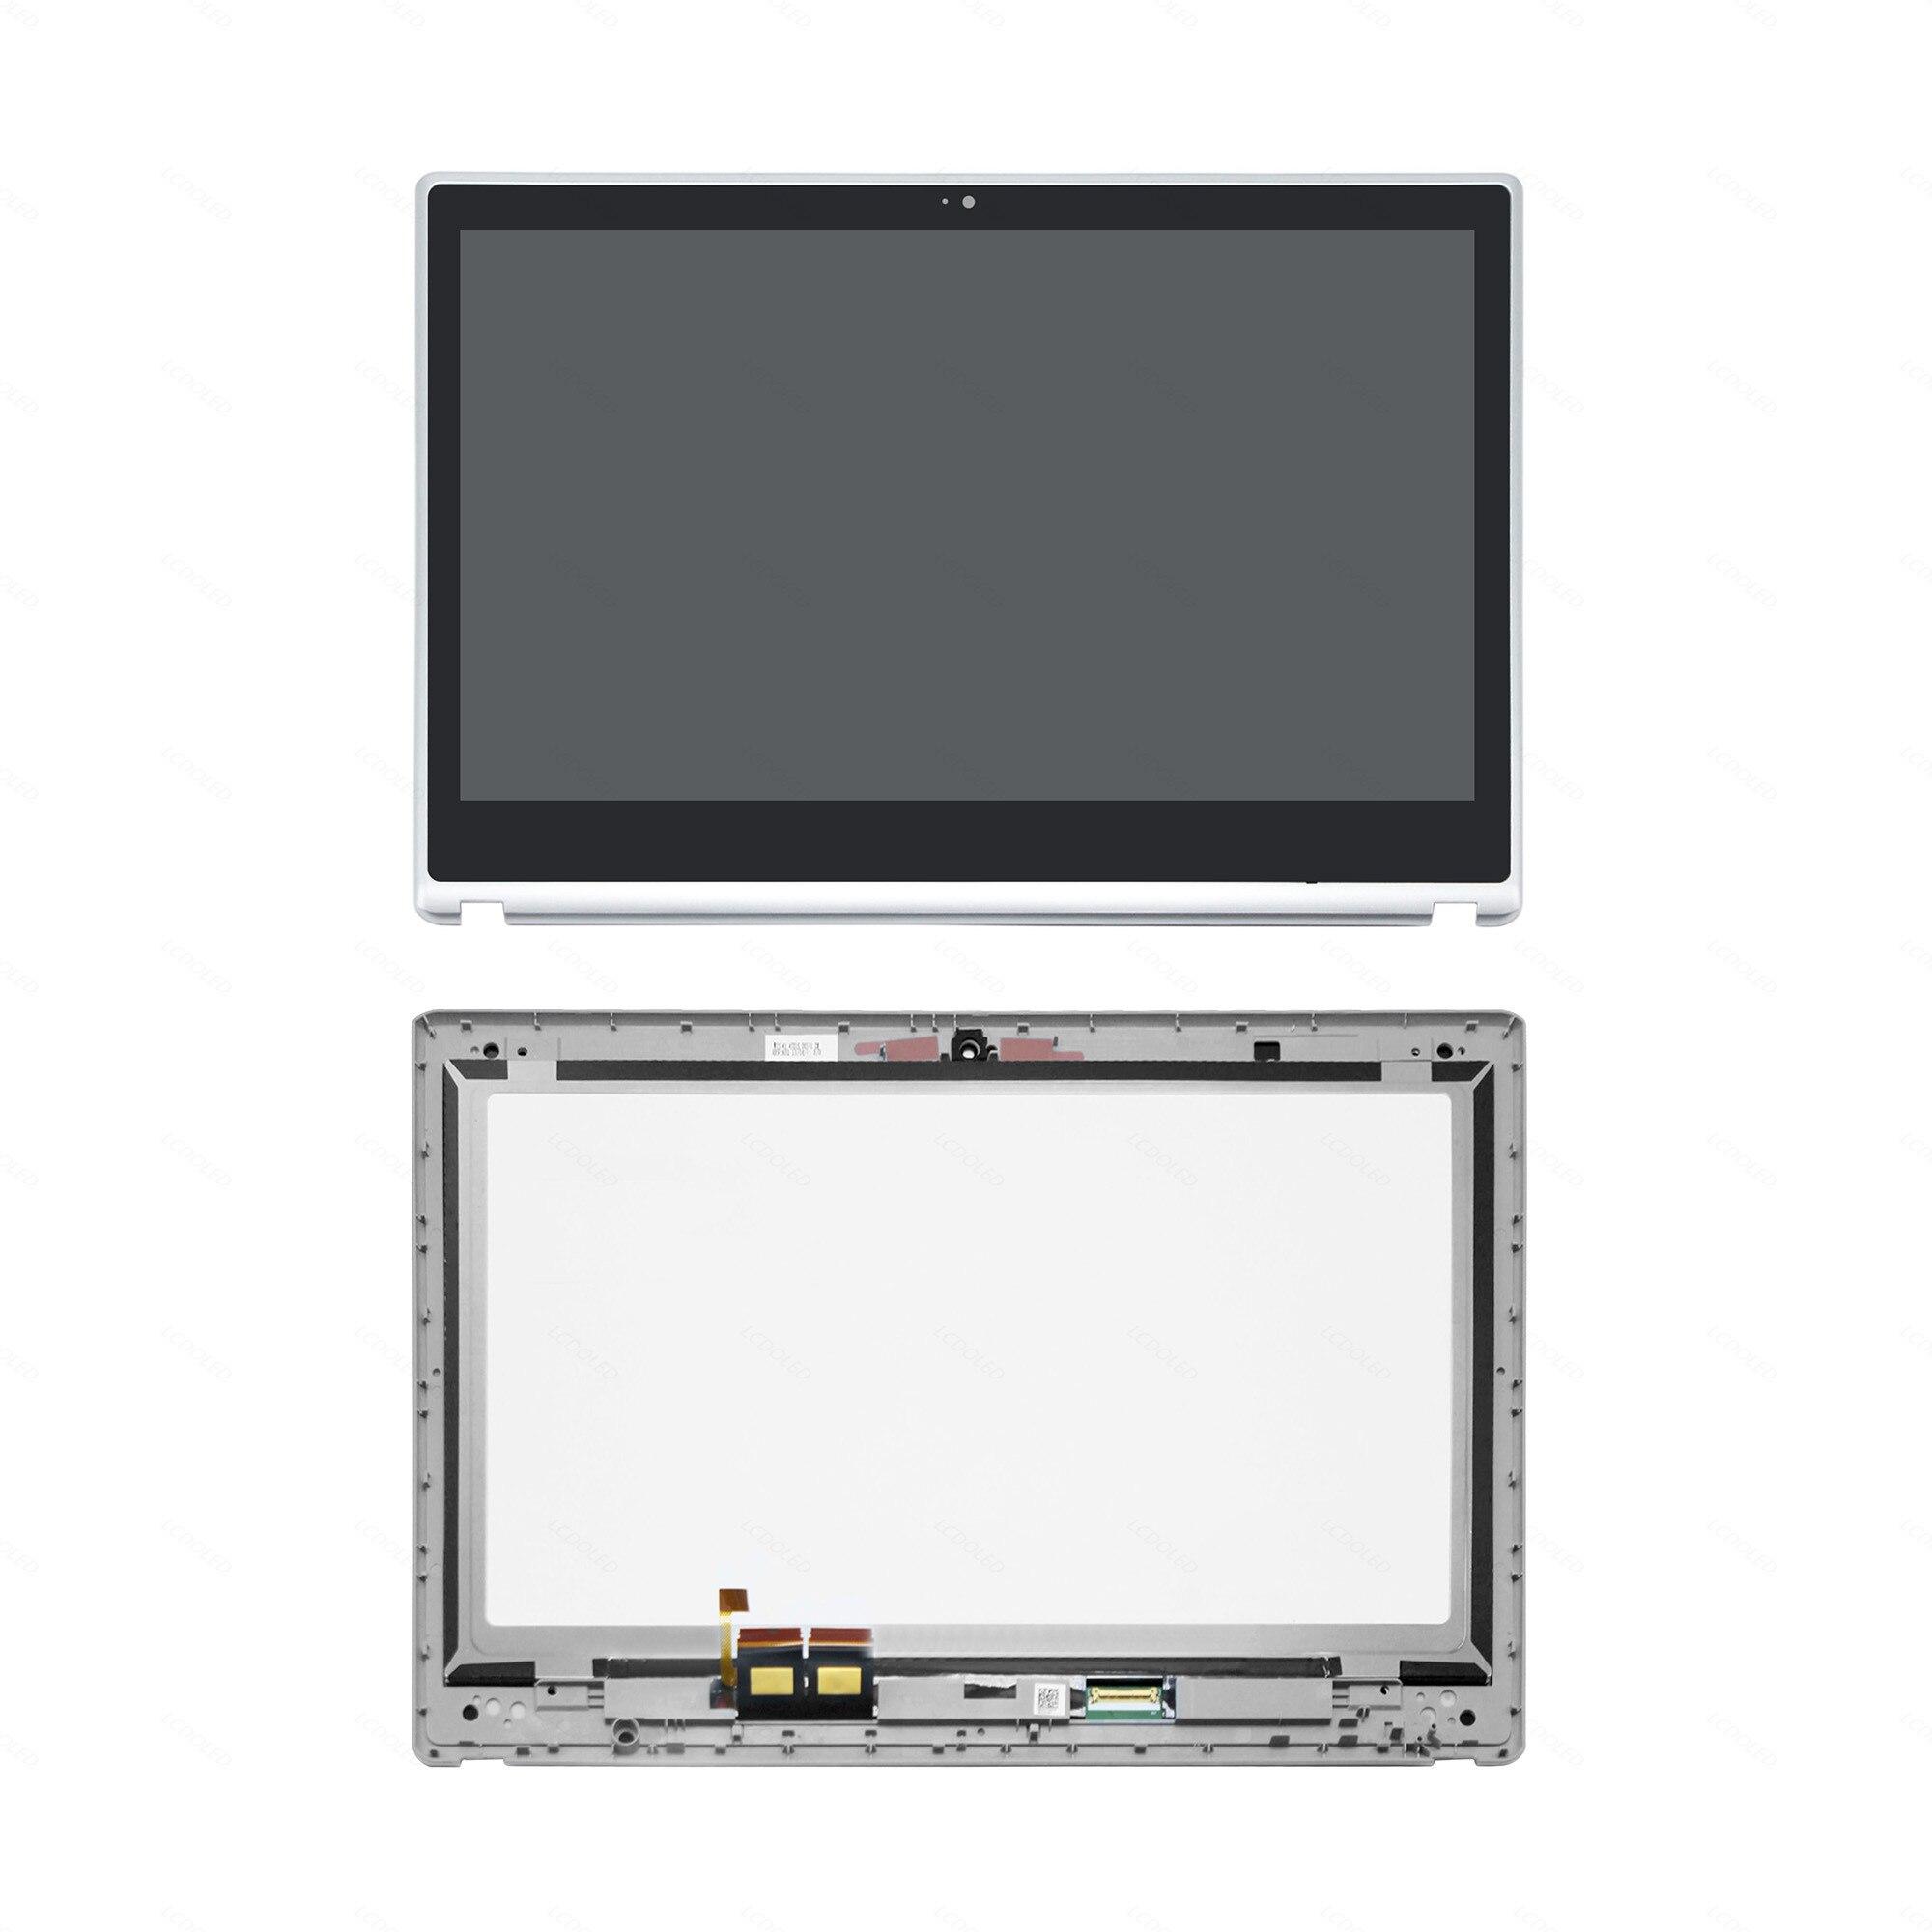 14 0 LCD Display Touch Screen Digitizer Assembly Panel Bezel For Acer Aspire V5 431 V5